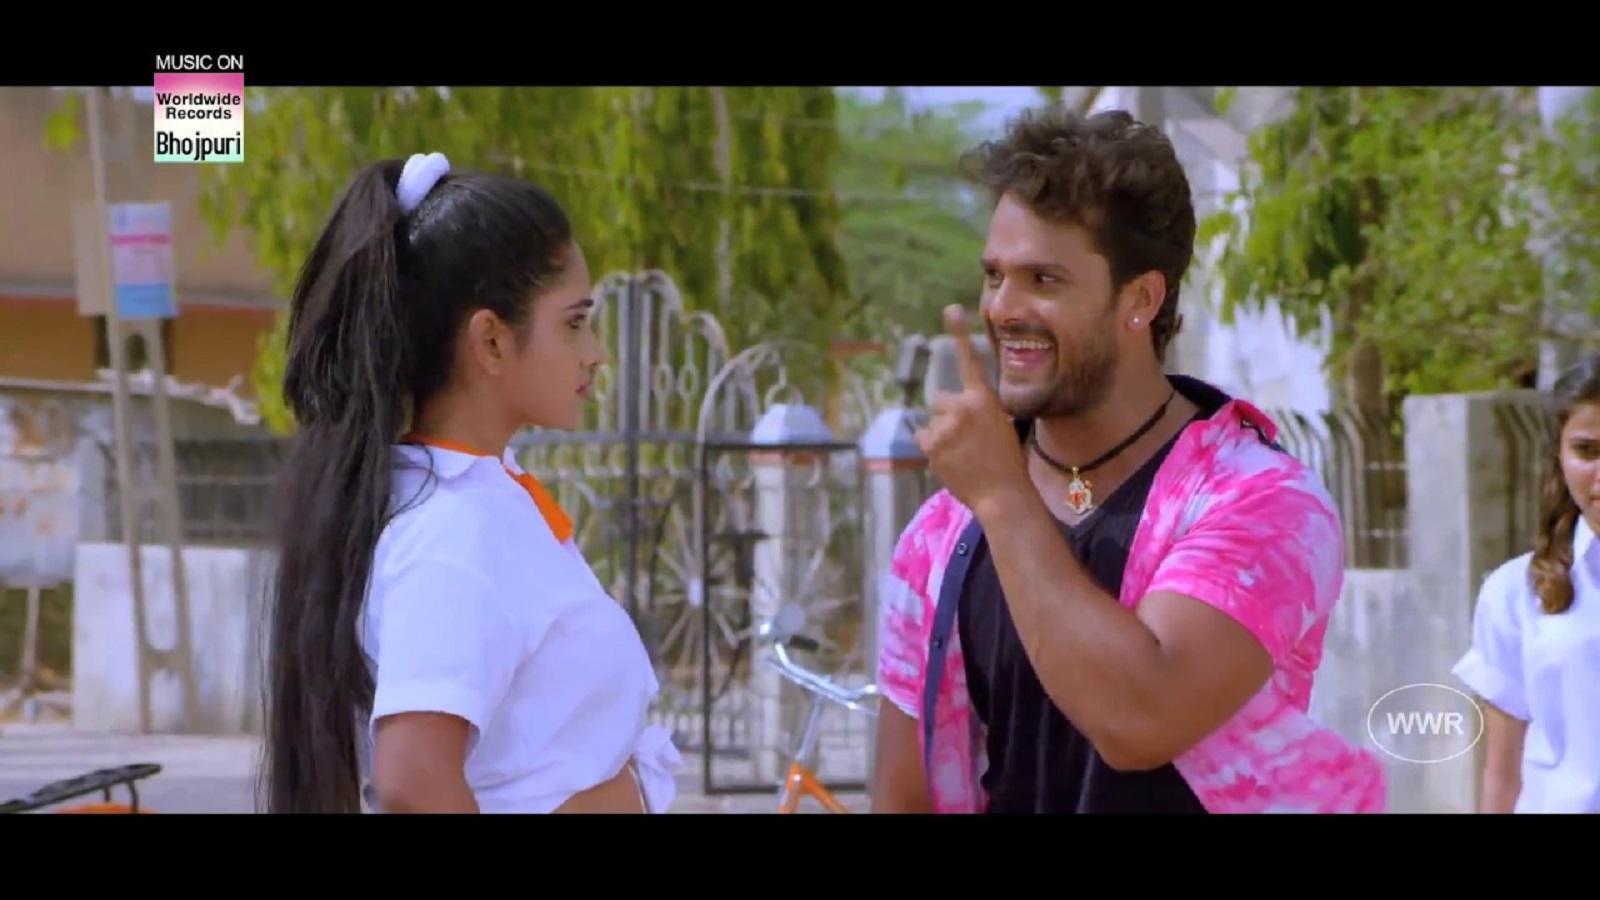 Watch: Bhojpuri song 'Laga Ke Fair Lovely' from 'Mehandi Laga Ke Rakhna'  Ft  Khesari Lal Yadav and Ritu Singh